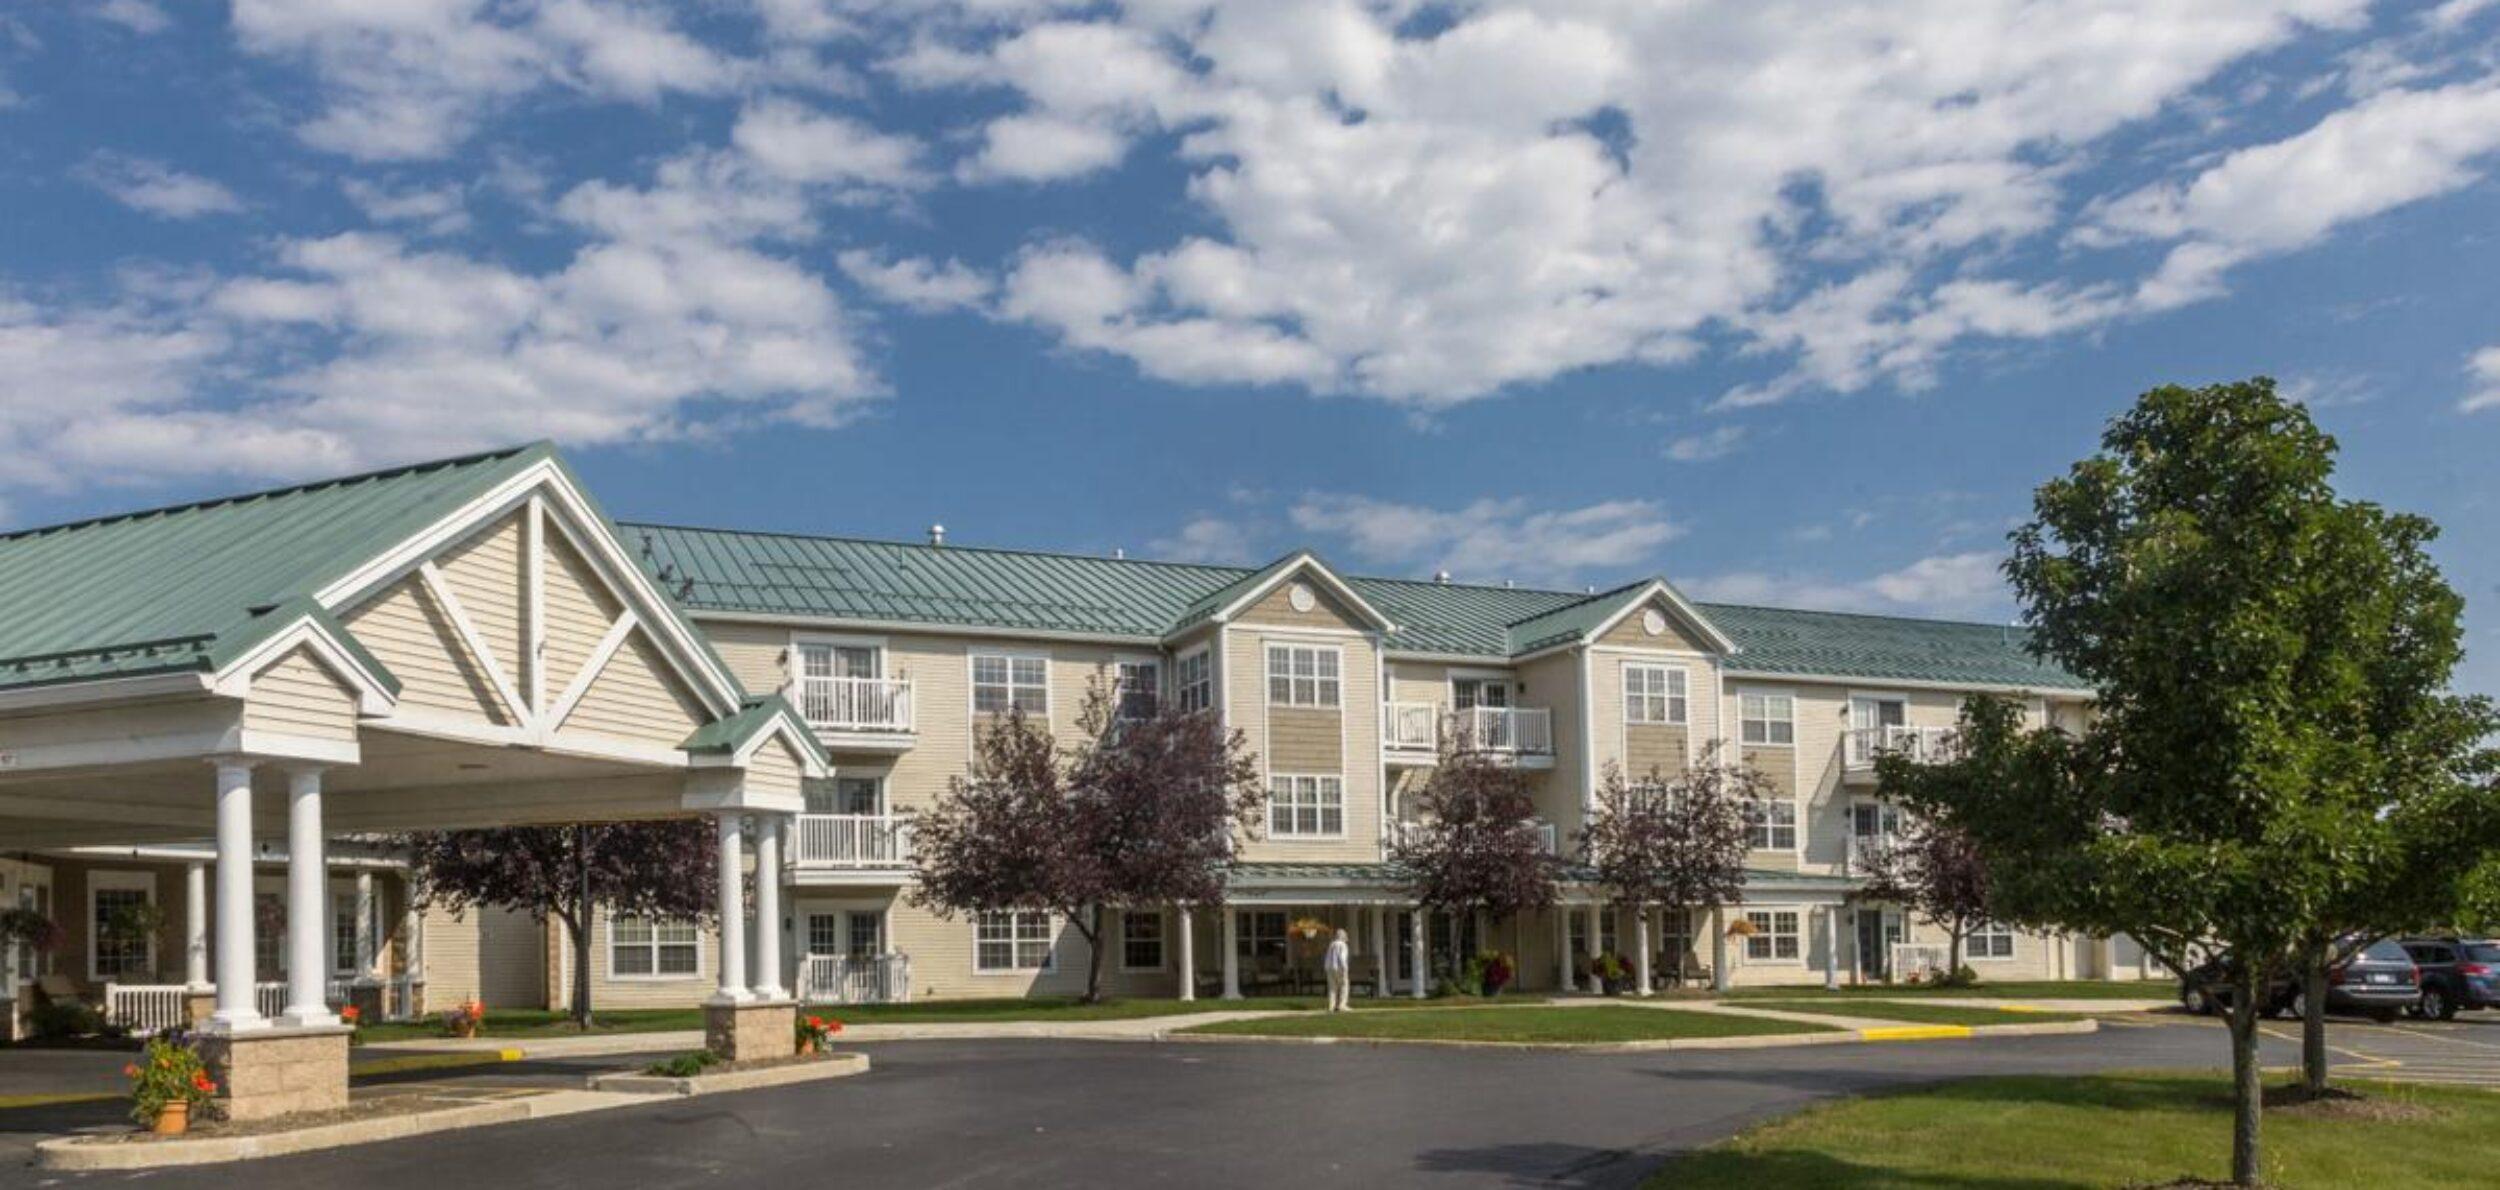 Chrisanntha Quail Summit Canandaigua Ny Housing